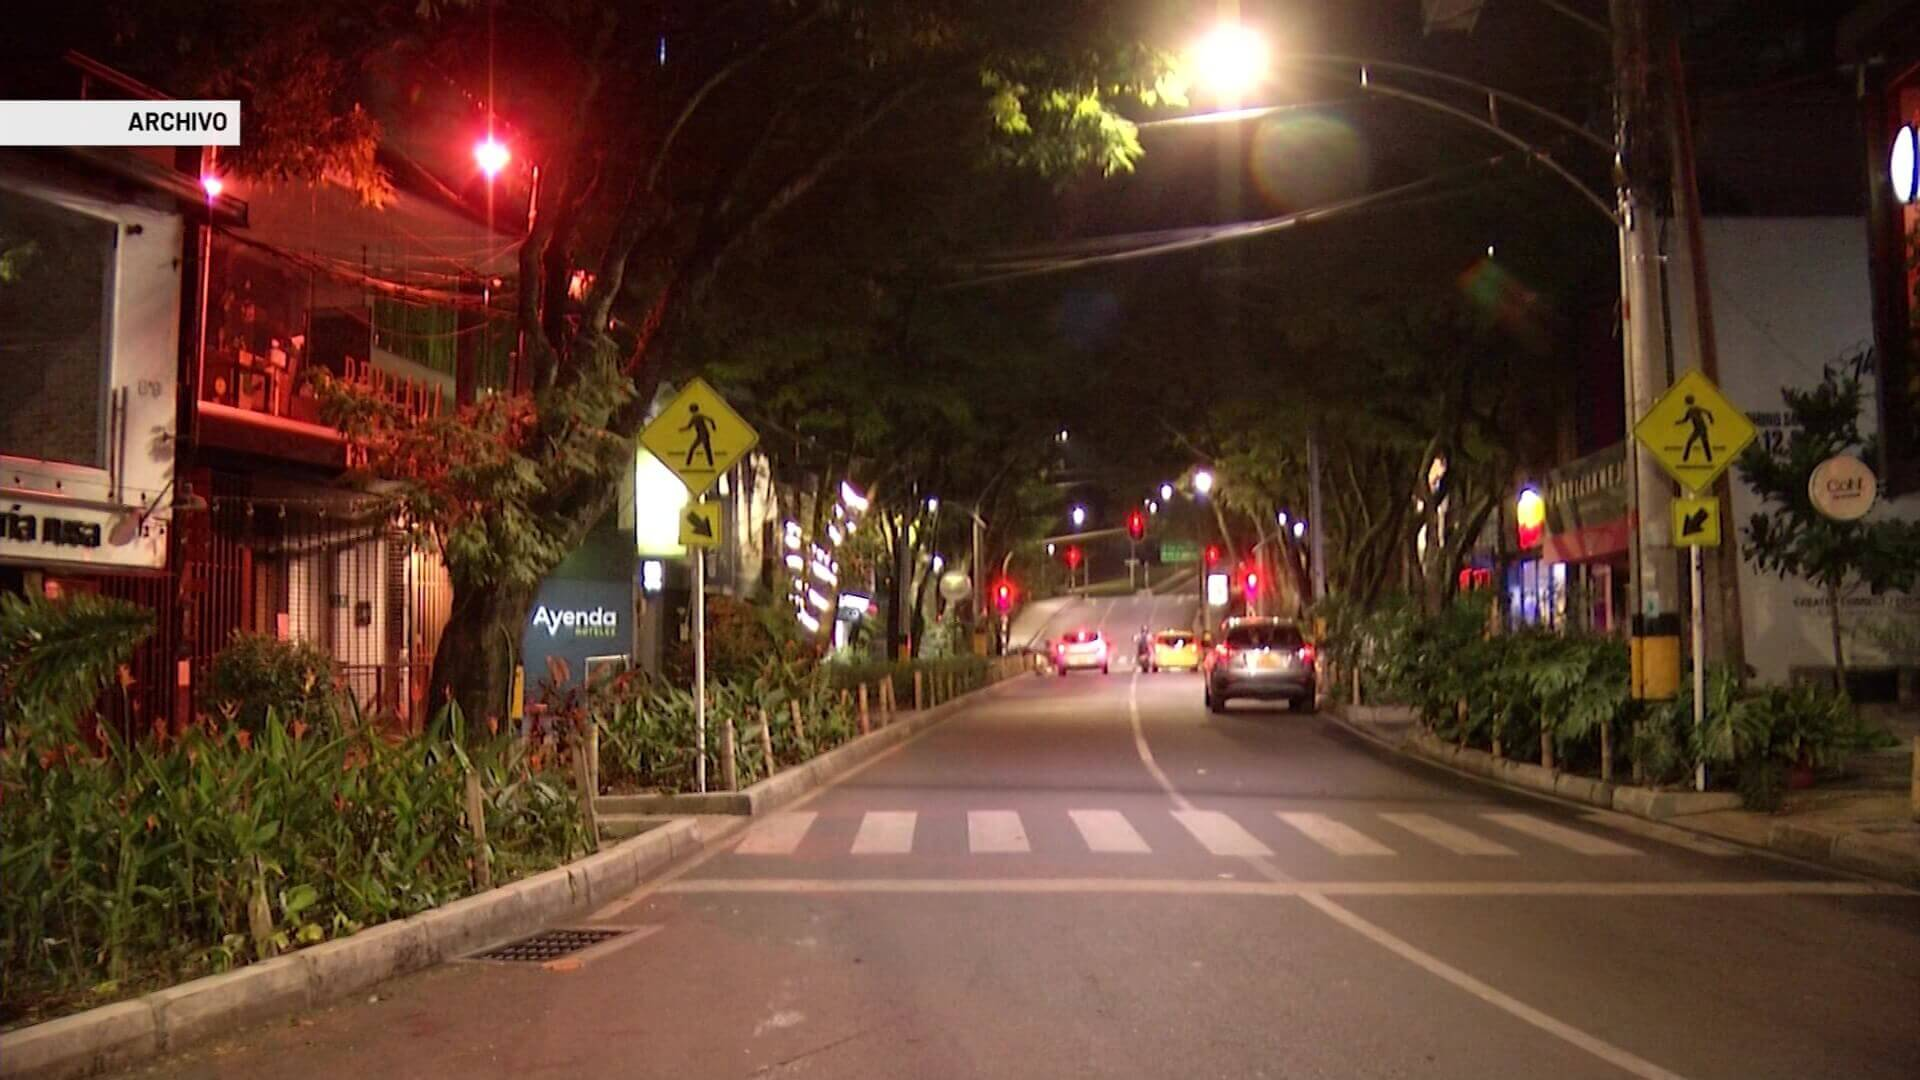 22 municipios de Antioquia presentan aumento en los contagios